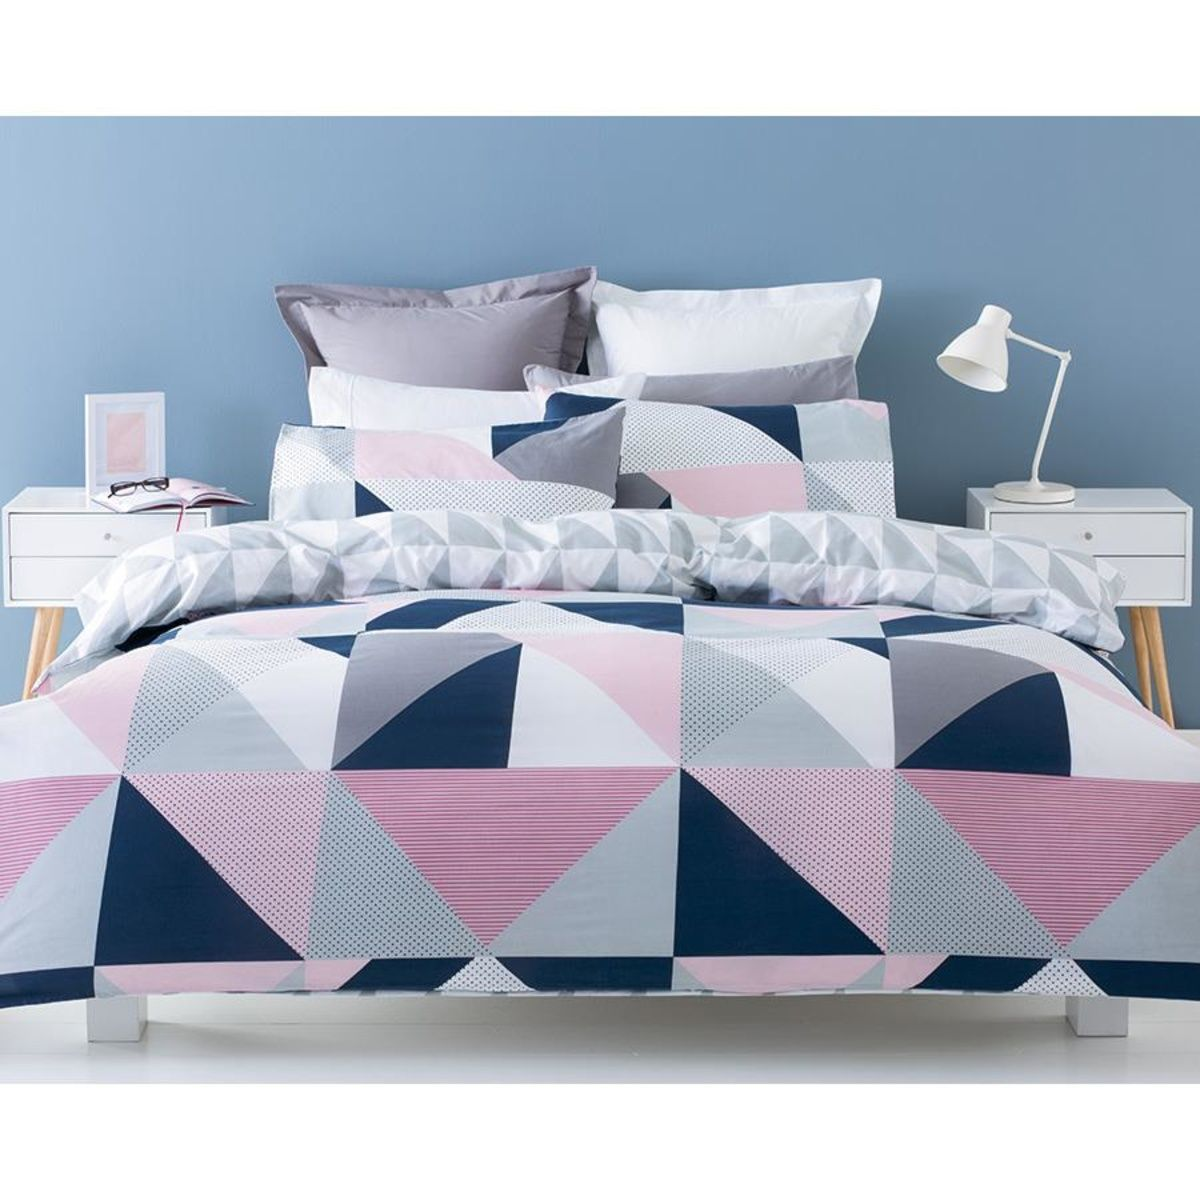 jasper reversible quilt cover set single bed kmart - Kmart Bedding